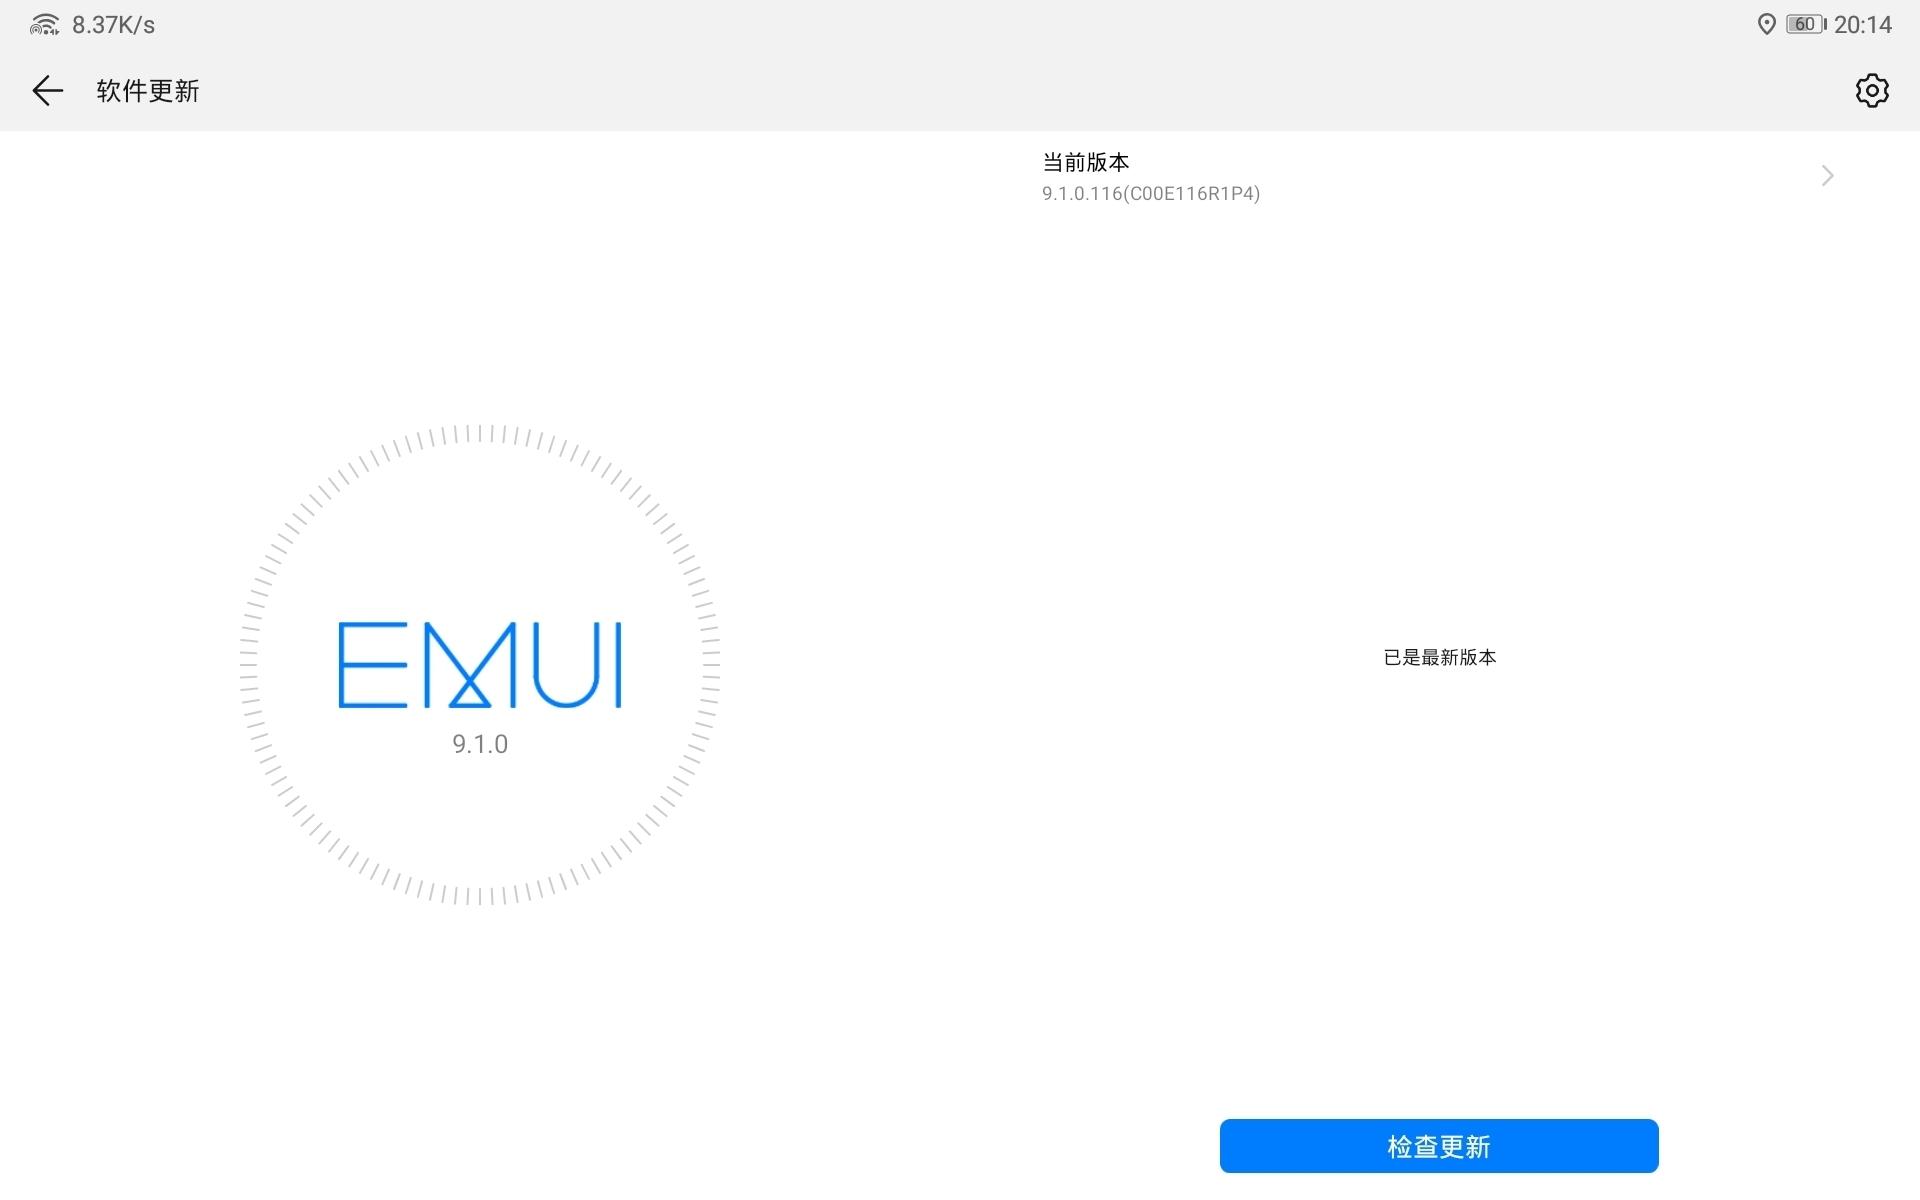 Screenshot_20190824_201437_com.huawei.android.hwouc.jpg